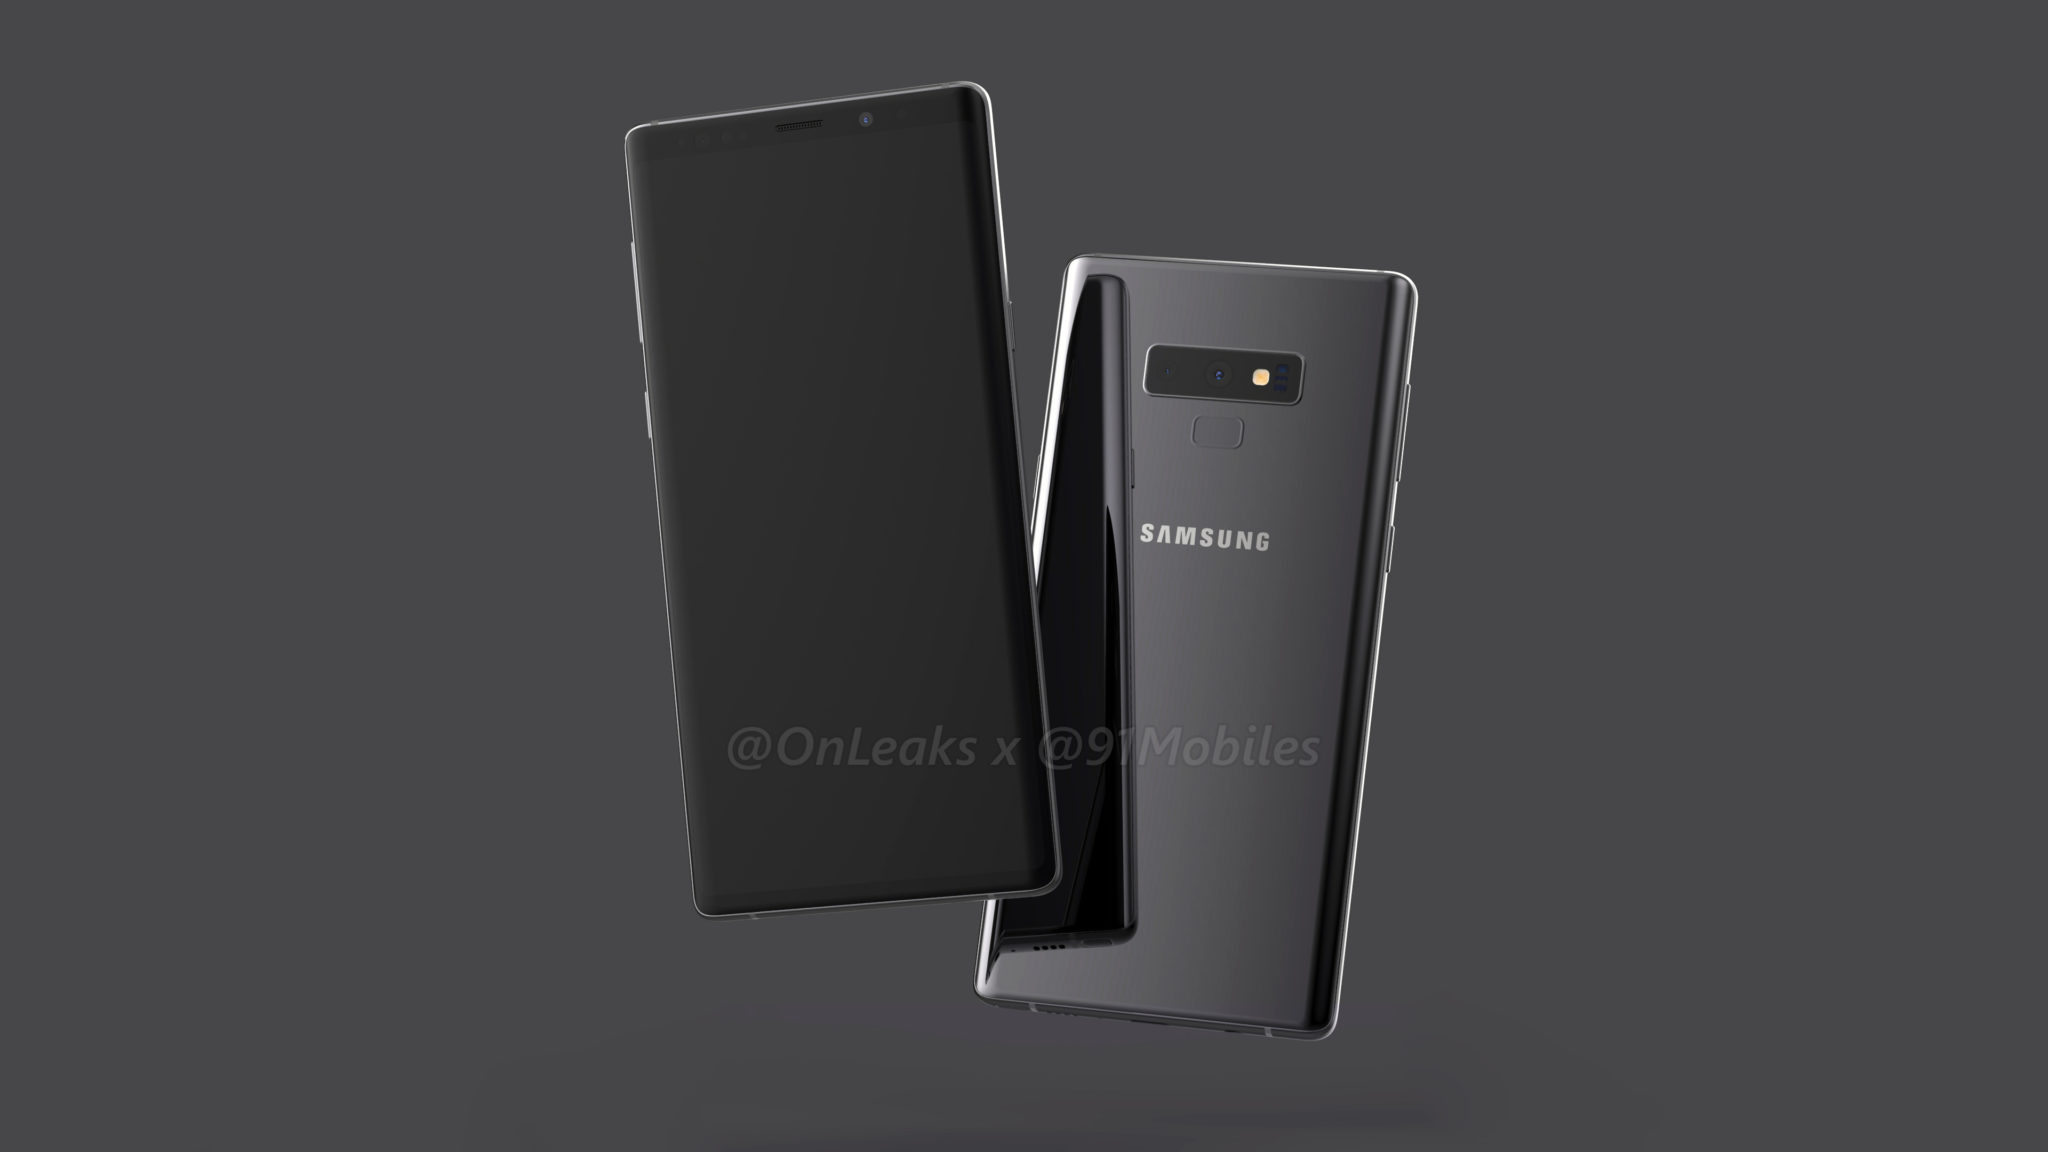 Samsung-Galaxy-Note-9-4k-render-91mobiles-4